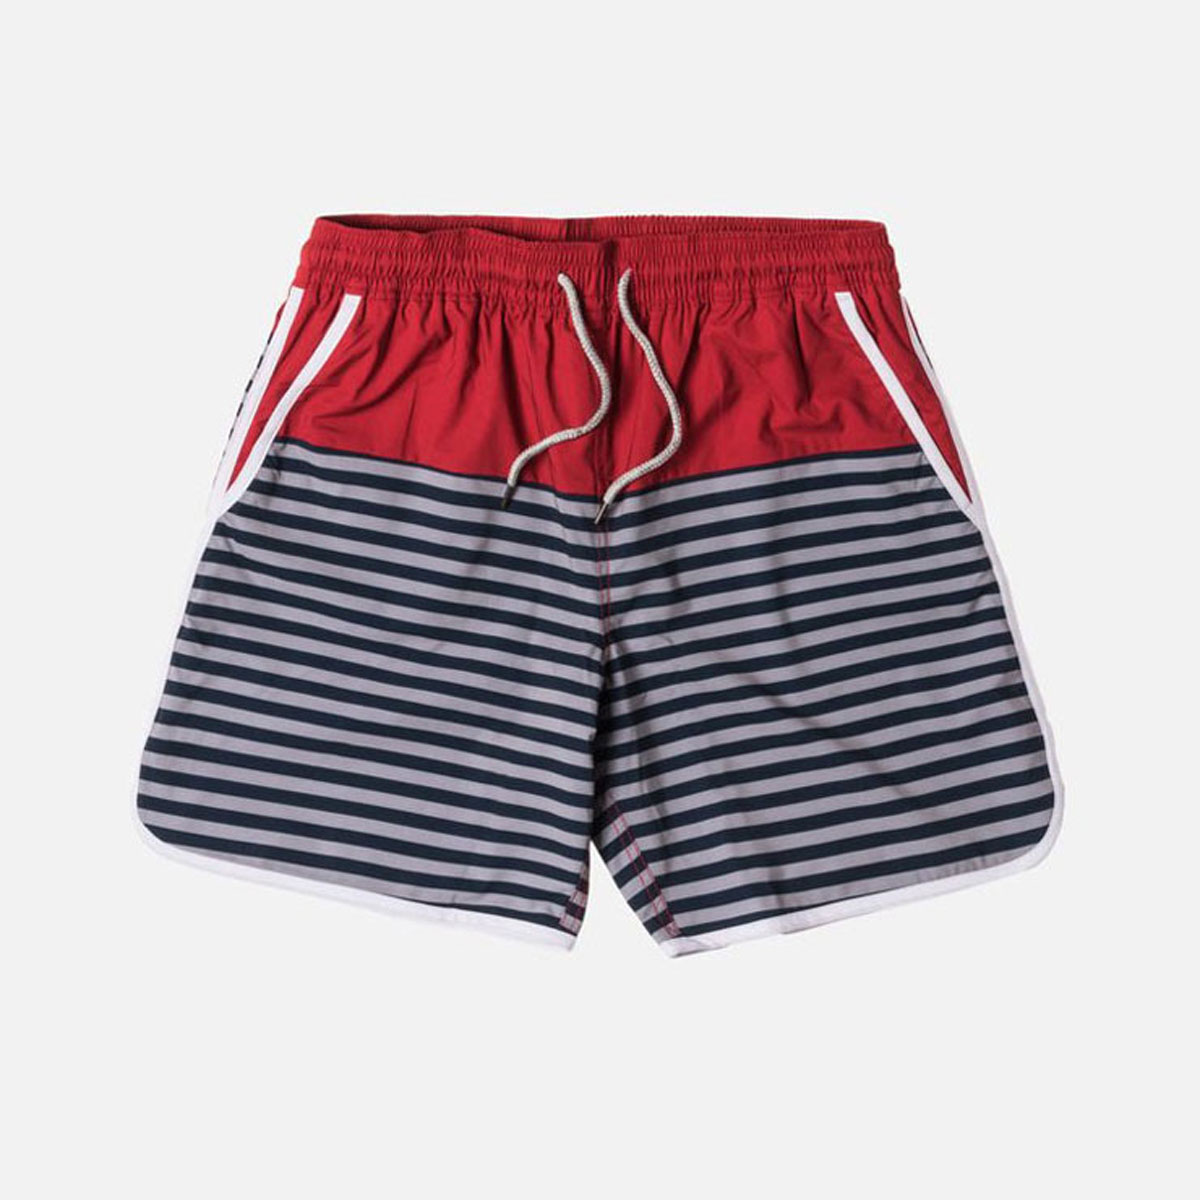 6c67e36241df6 ... Kiss KITH regular article men swimsuit swimming underwear KITH ROCKAWAY  SHORT KH7002-106 RED ...